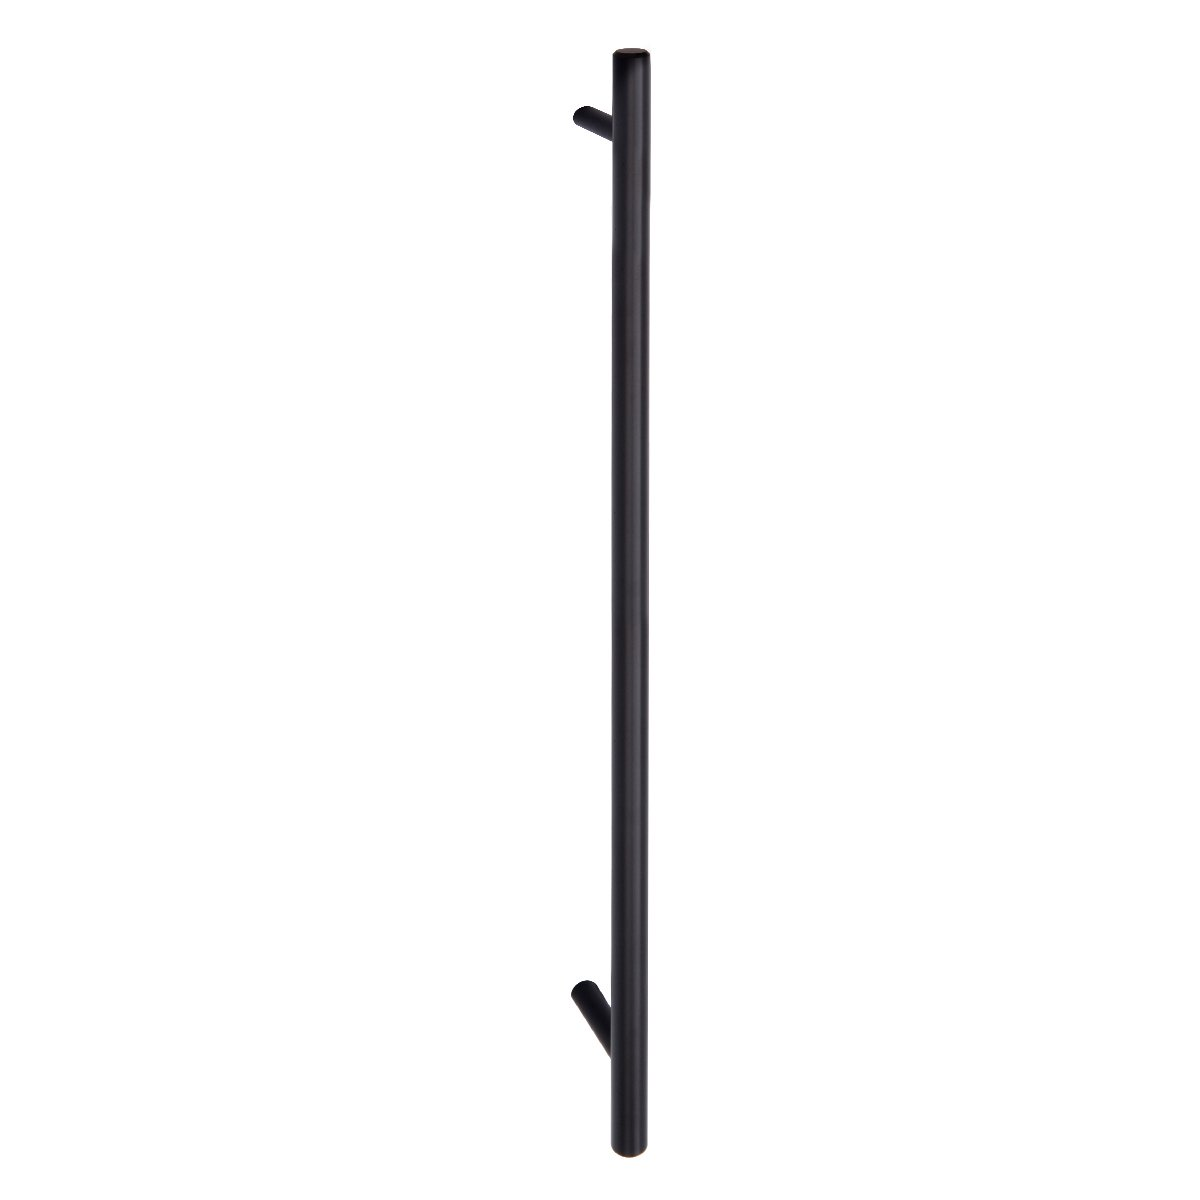 9,52 mm de di/ámetro Paquete de 10 Basics centro del orificio de 8,89 cm Tirador de armario en forma de barra Cromo pulido 14,93 cm de longitud tipo europeo